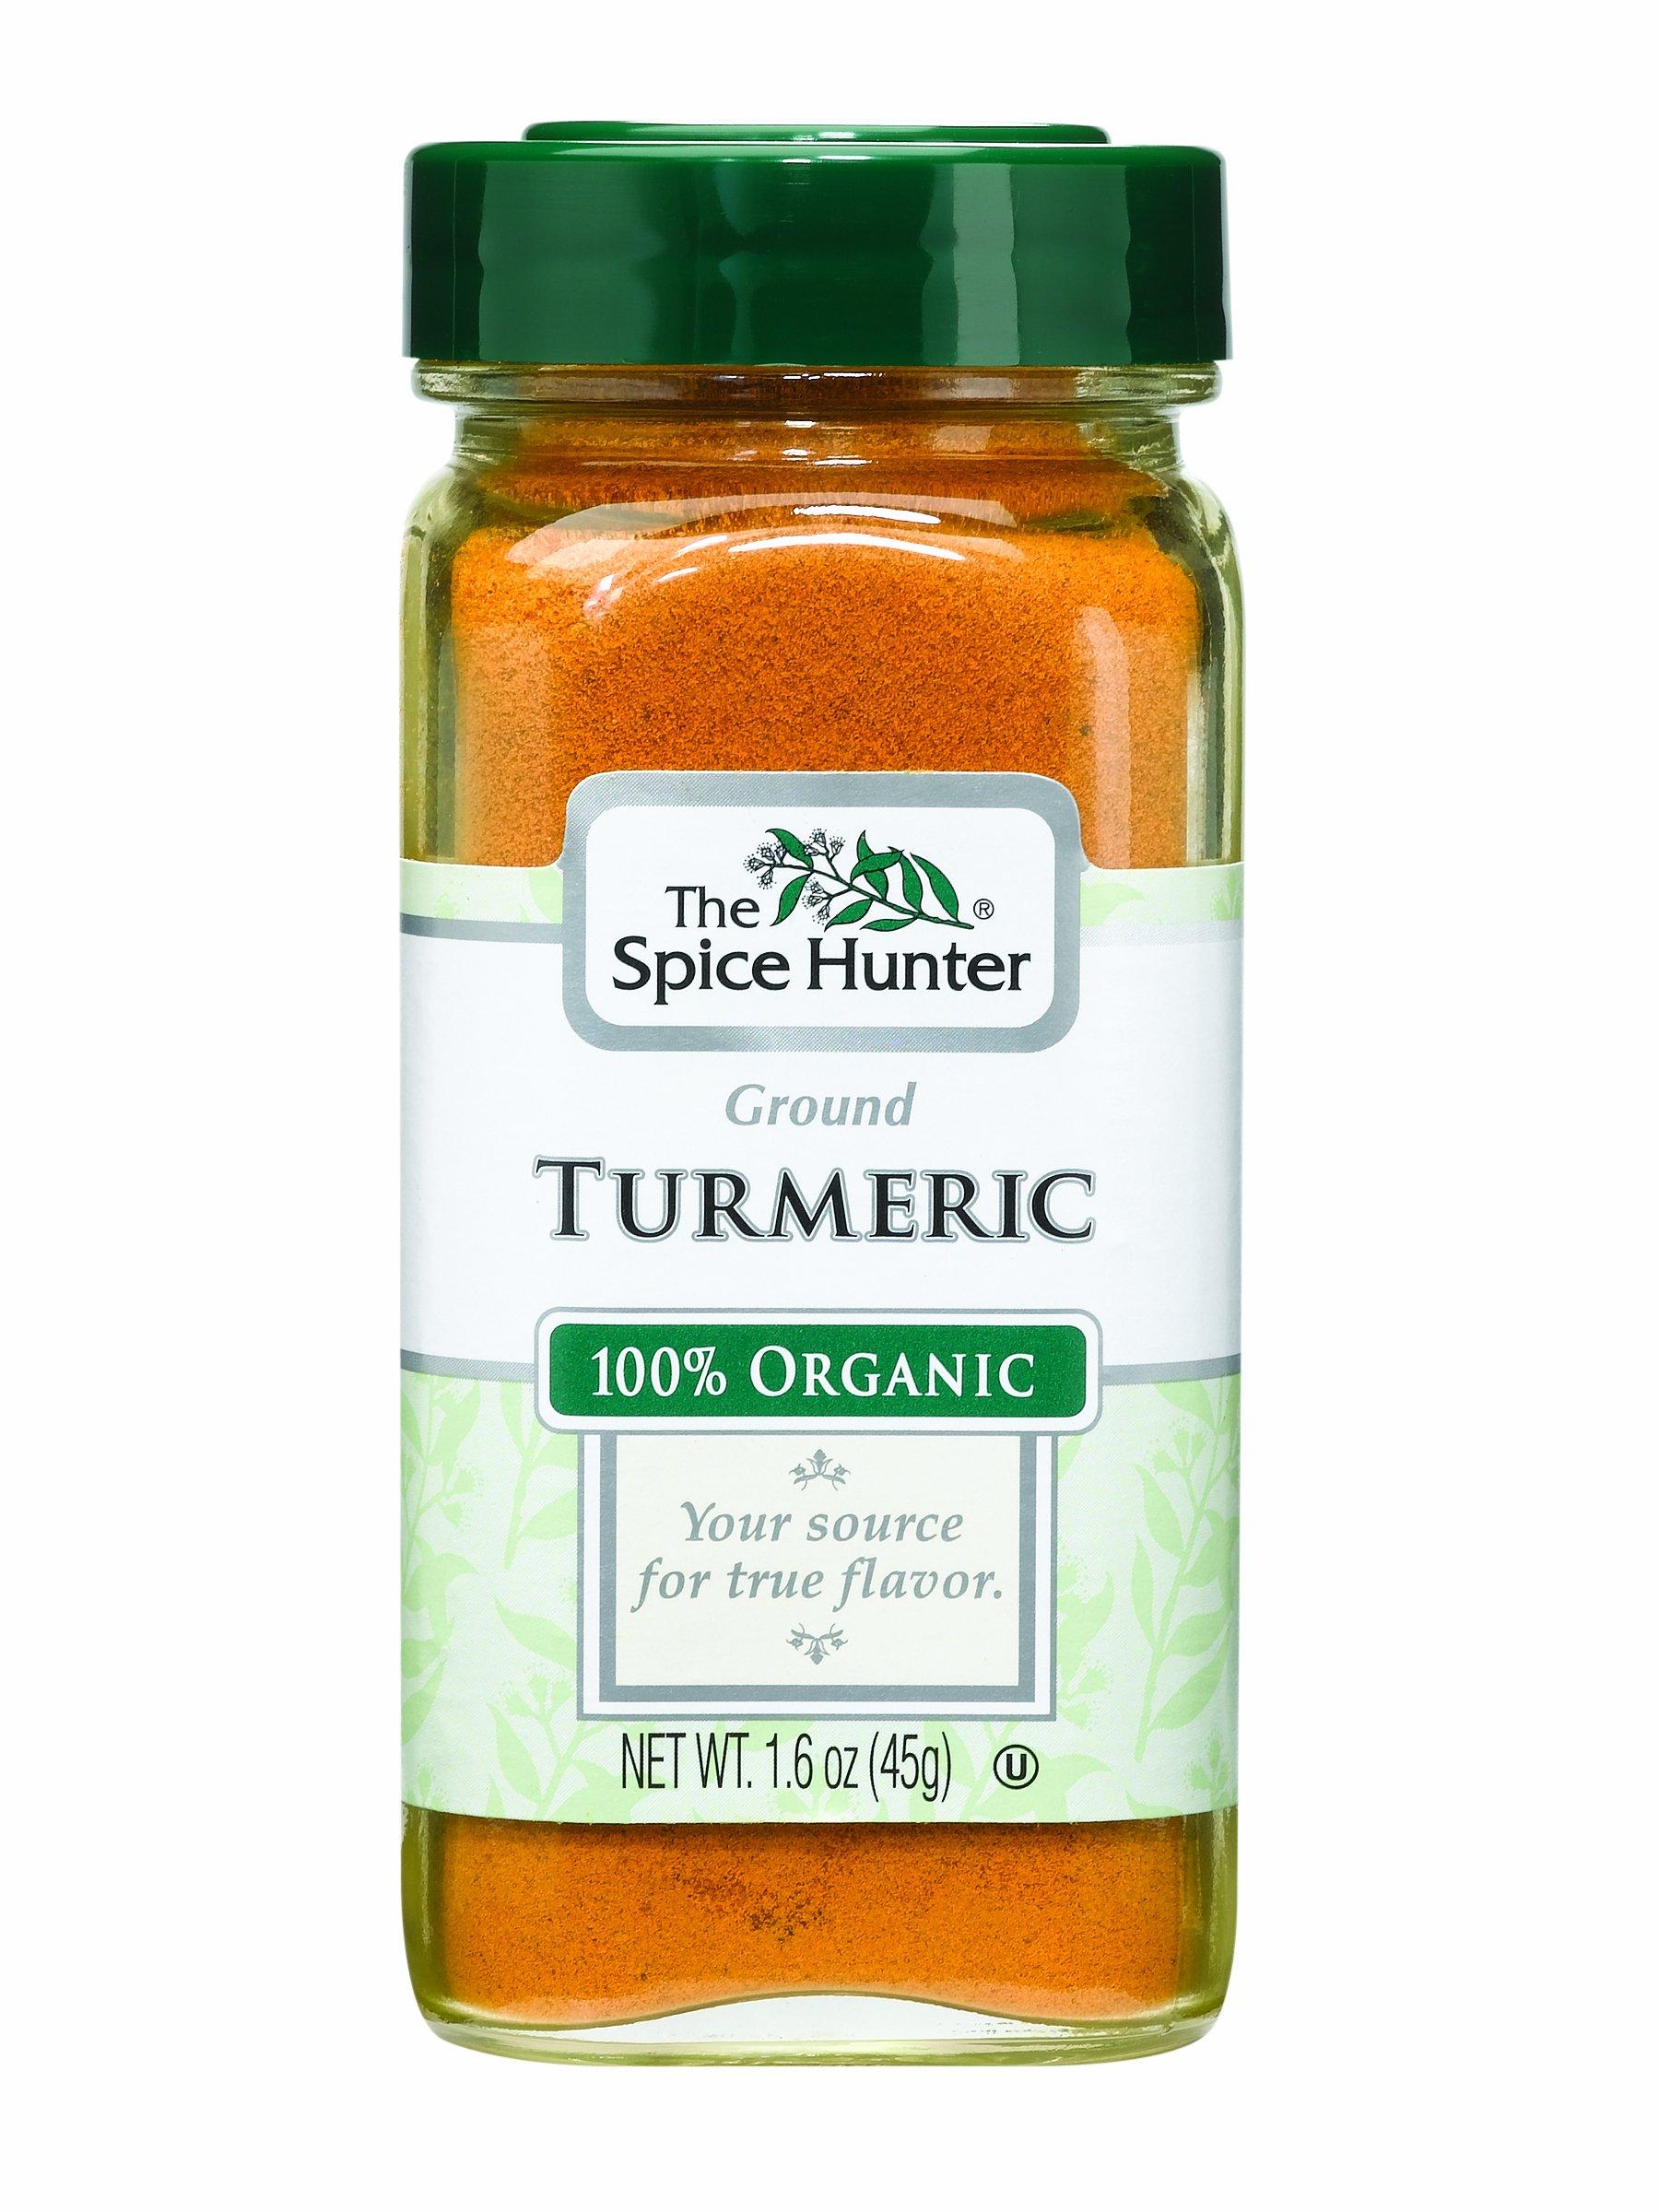 The Spice Hunter Turmeric, Ground, Organic, 1.6-Ounce Jars (Pack of 6)